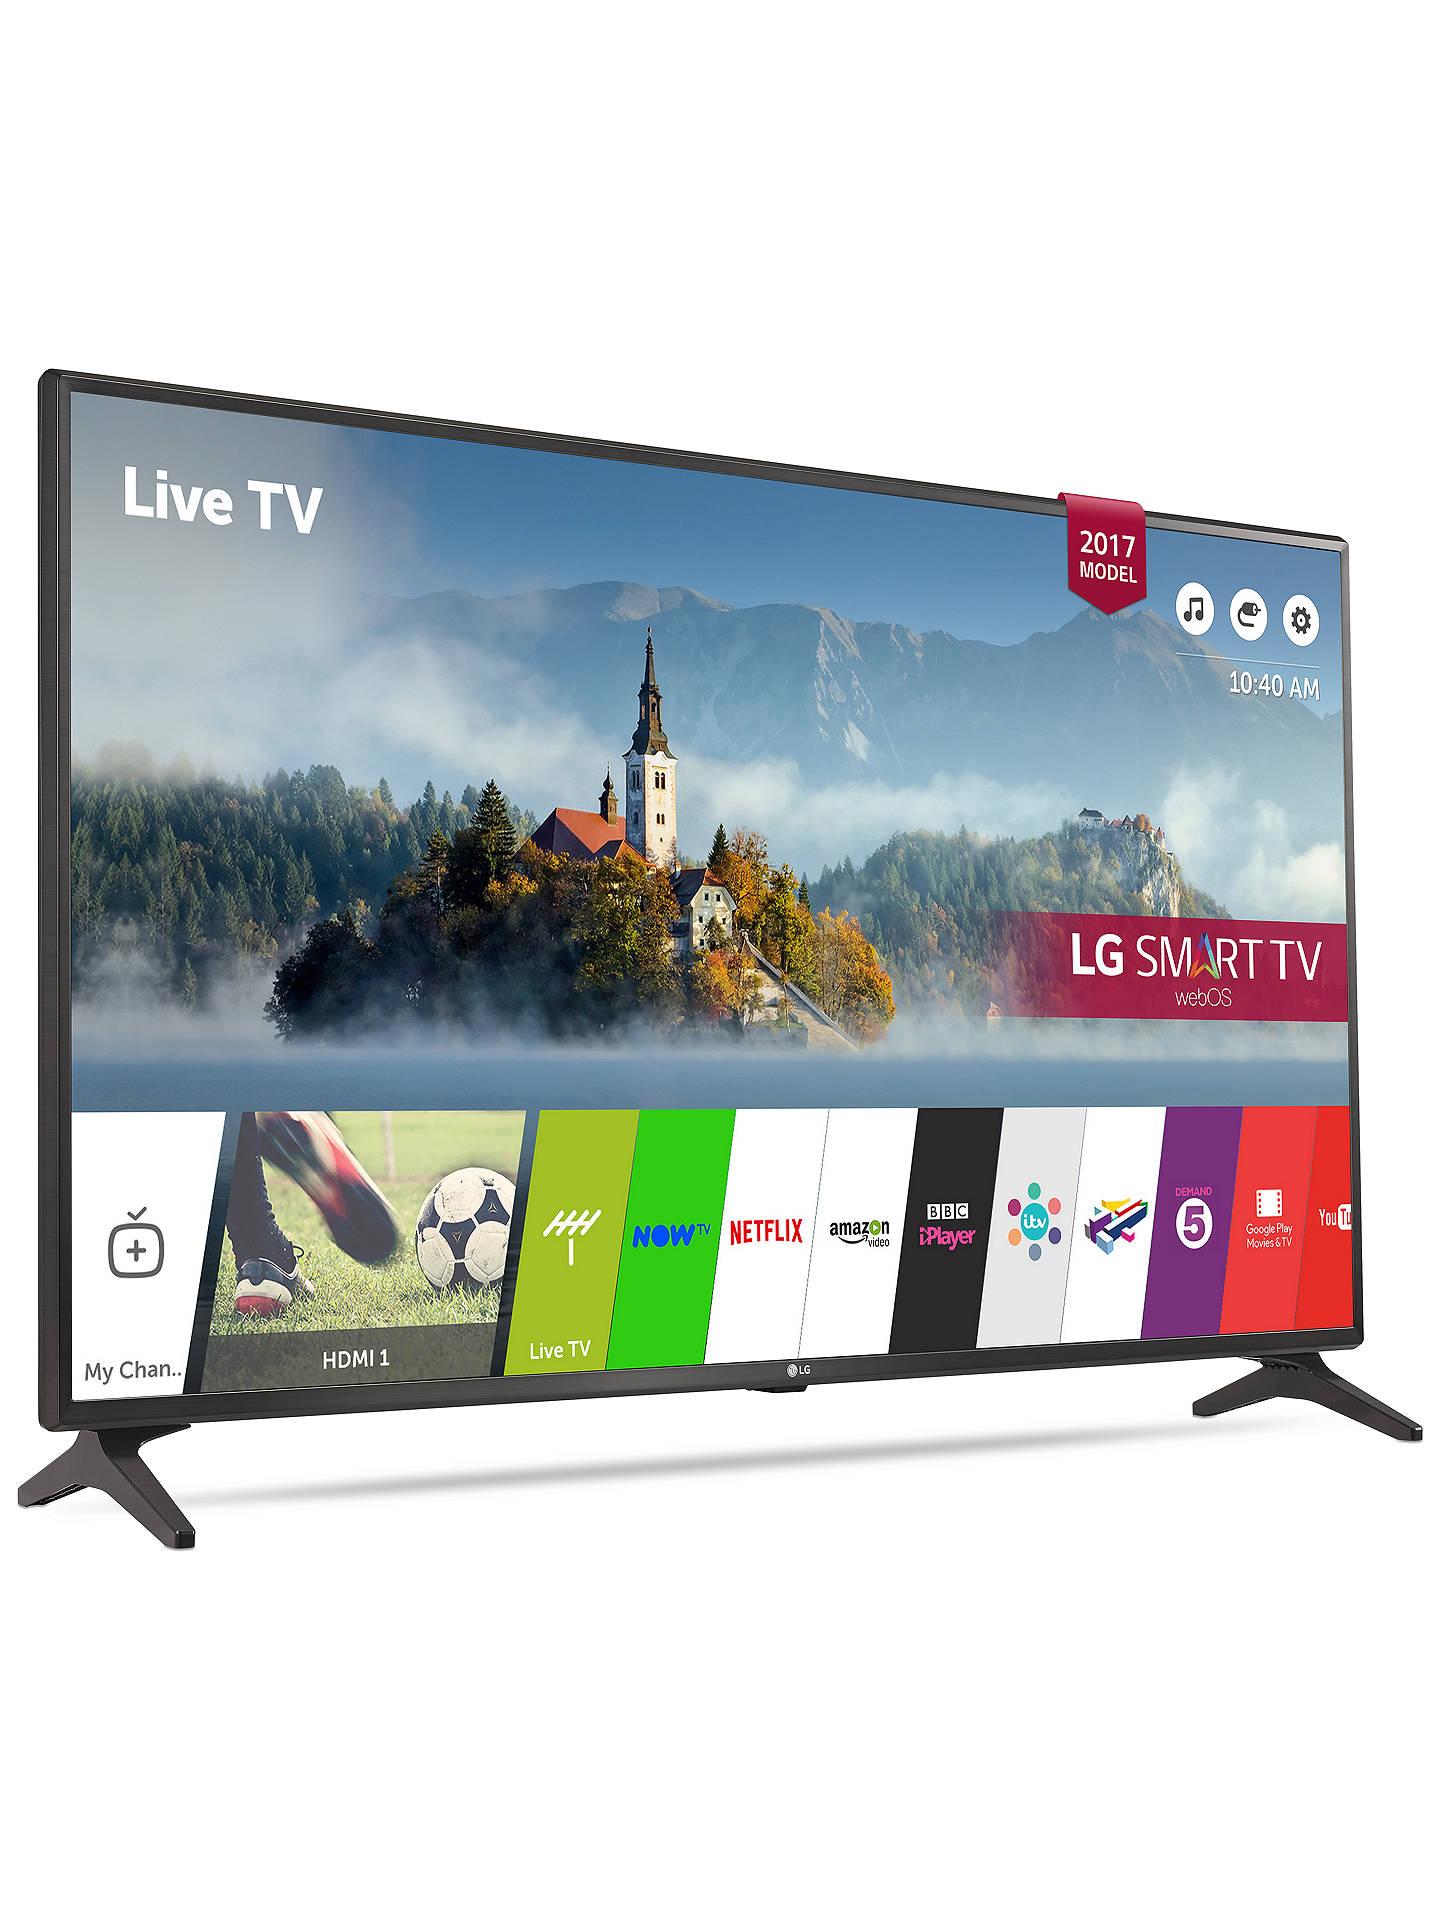 Lg 43lj594v Led Full Hd 1080p Smart Tv 43 With Freesat Hd Freeview Play Black At John Lewis Partners